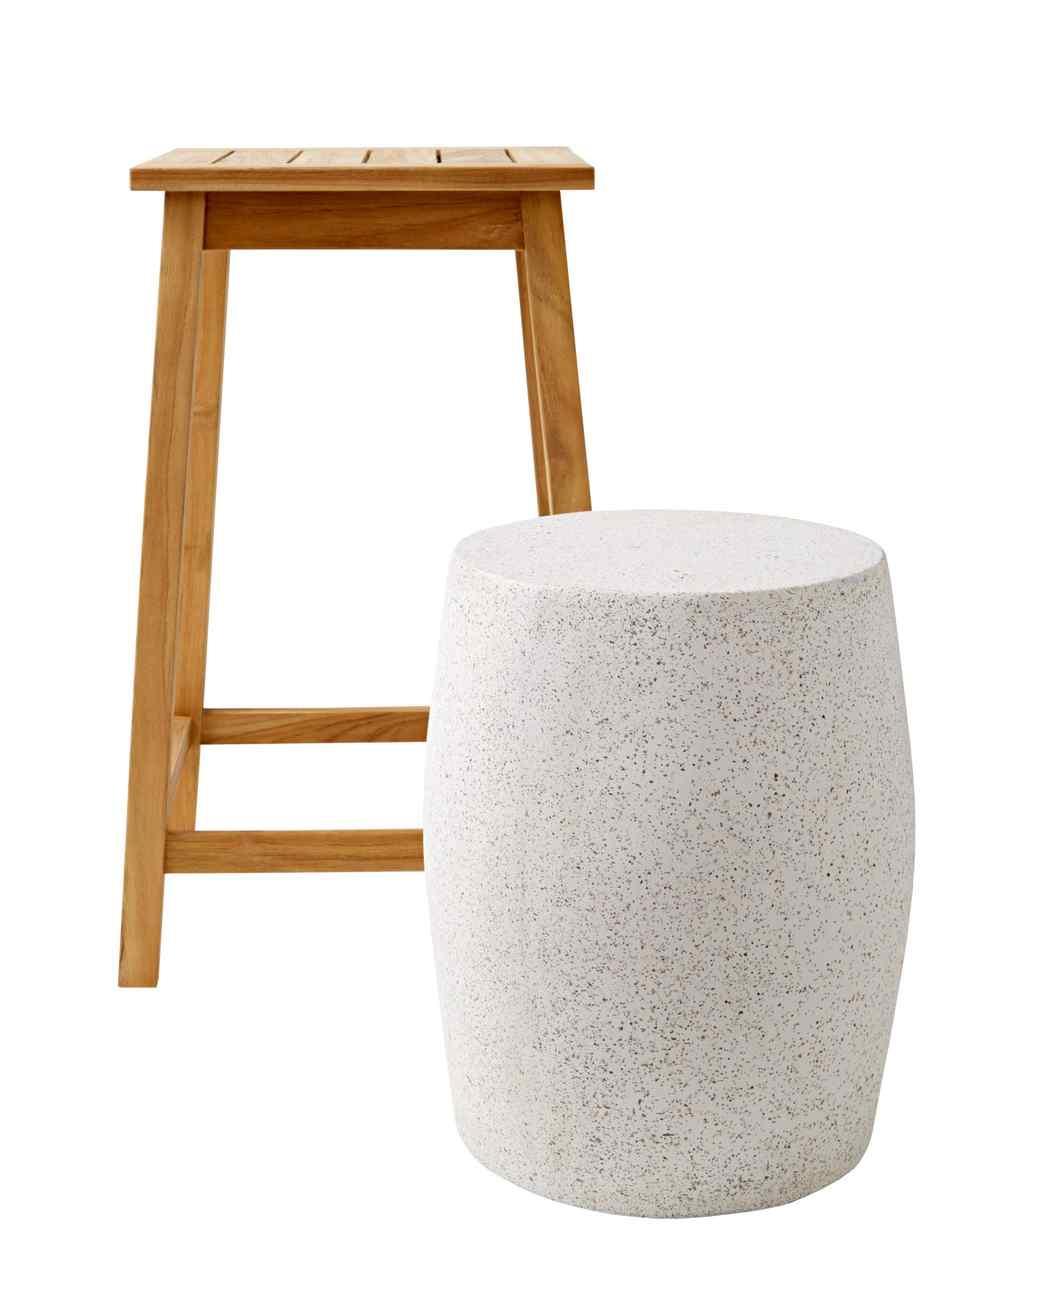 stool-8002-d112979_l.jpg